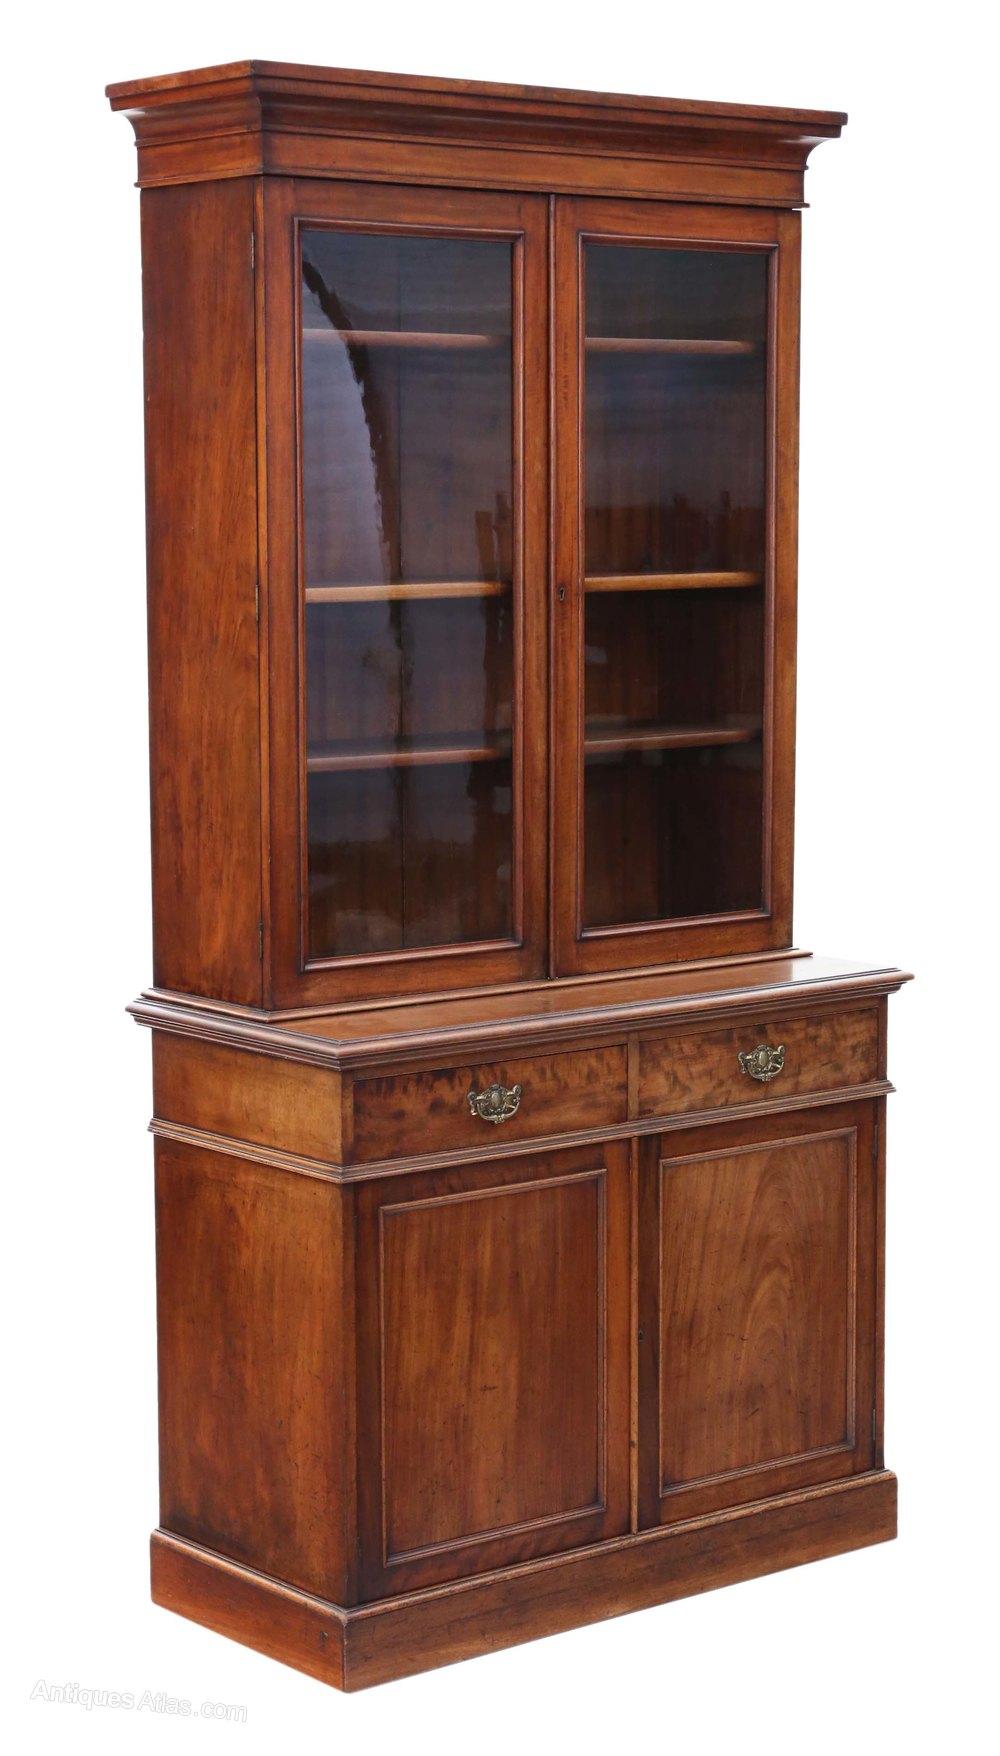 Victorian Mahogany Glazed Bookcase Cupboard Antiques Atlas